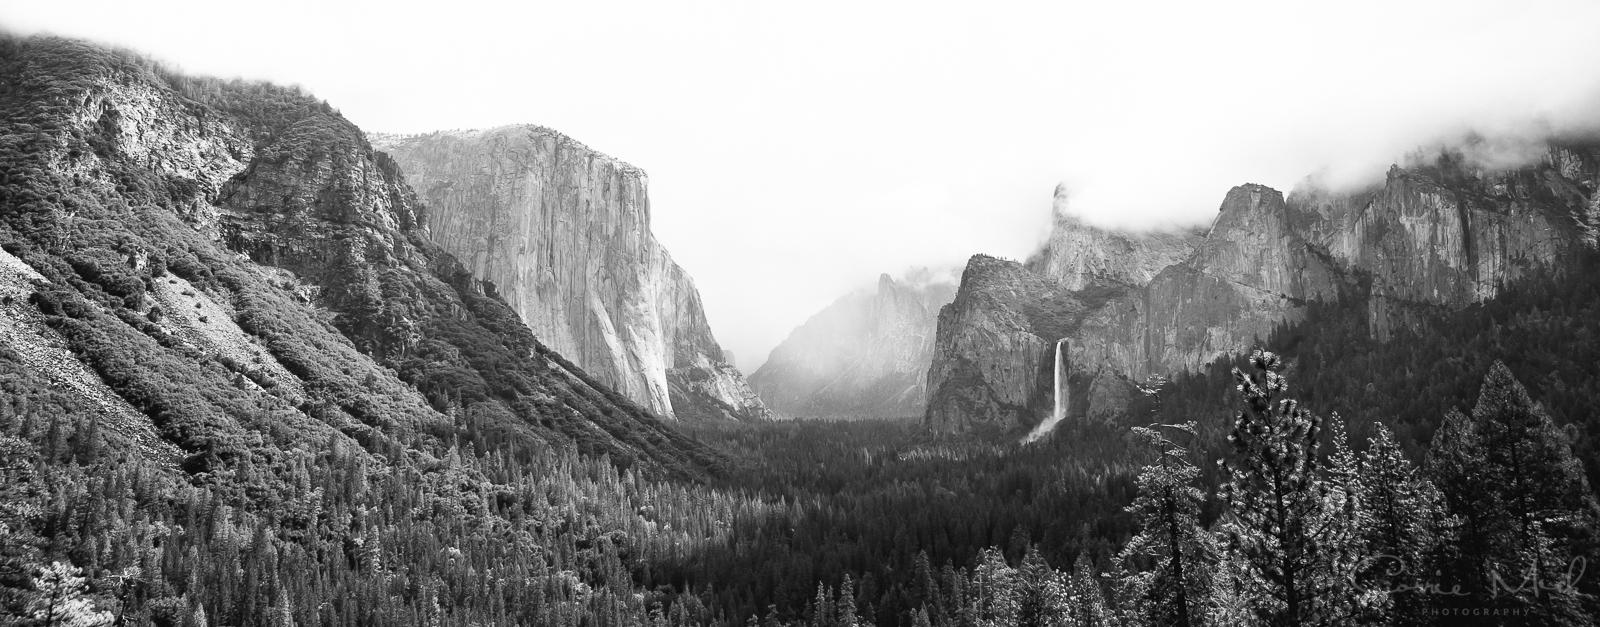 Yosemite April 2016 - Corrie Mick Photography-11.jpg